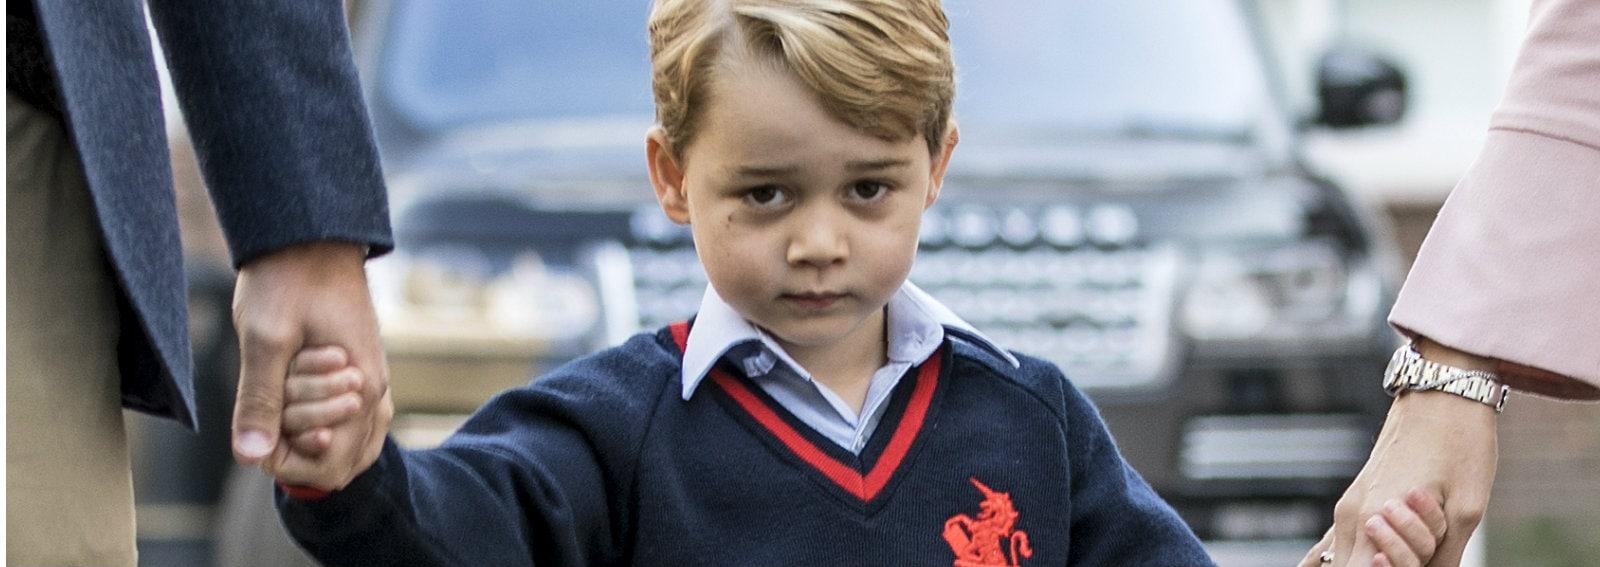 prince george scuola